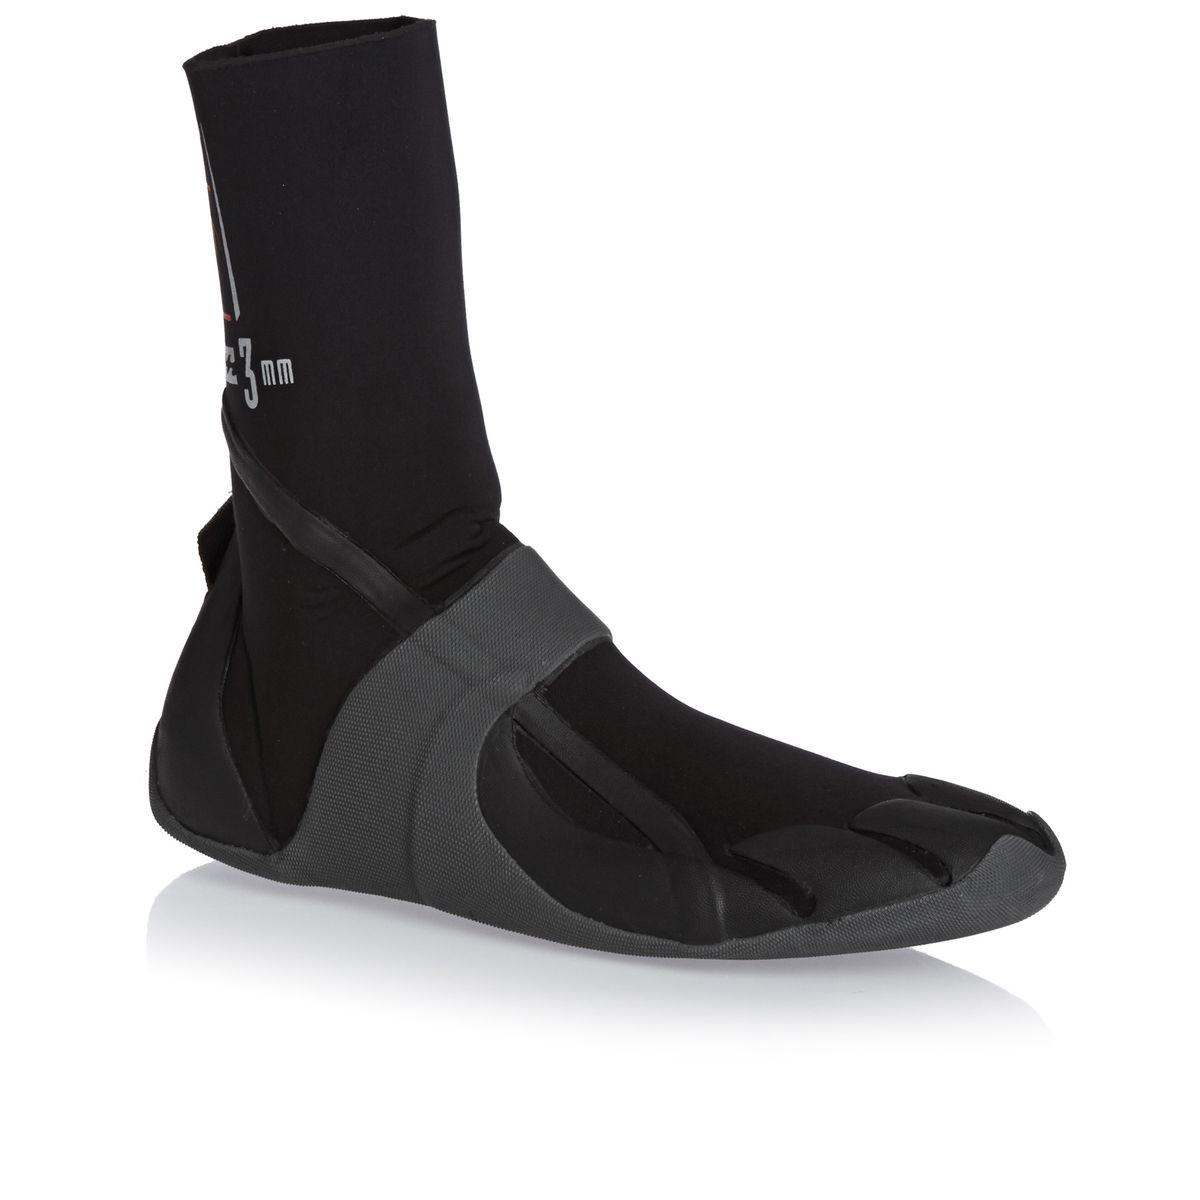 Billabong Foil Round Toe Wetsuit Boots - 3mm